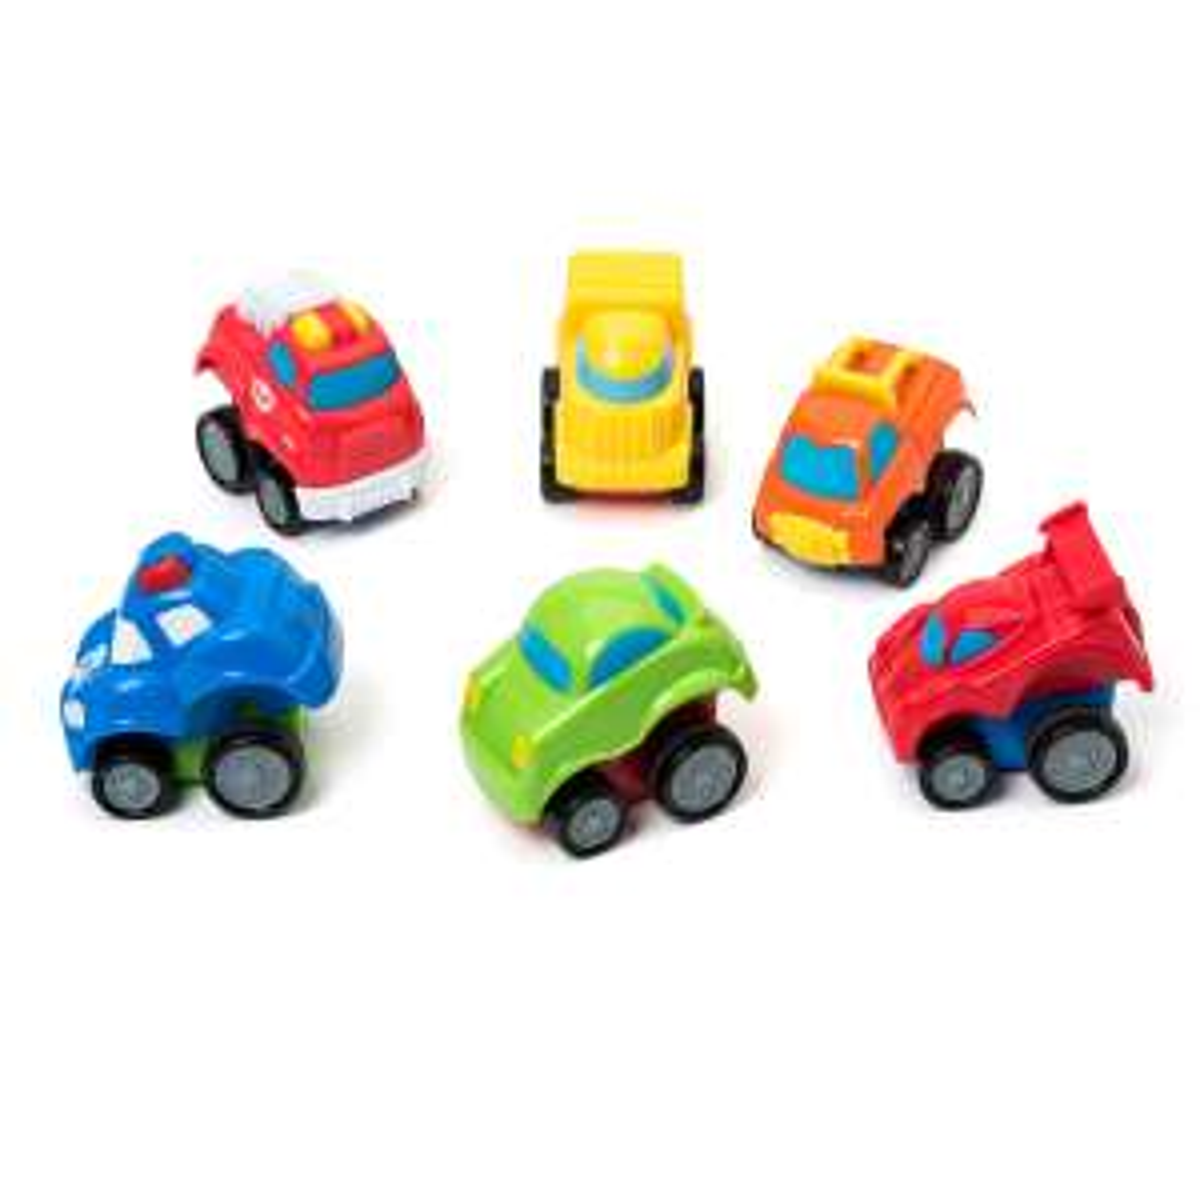 Lot de 6 véhicules Press and go Oxybul